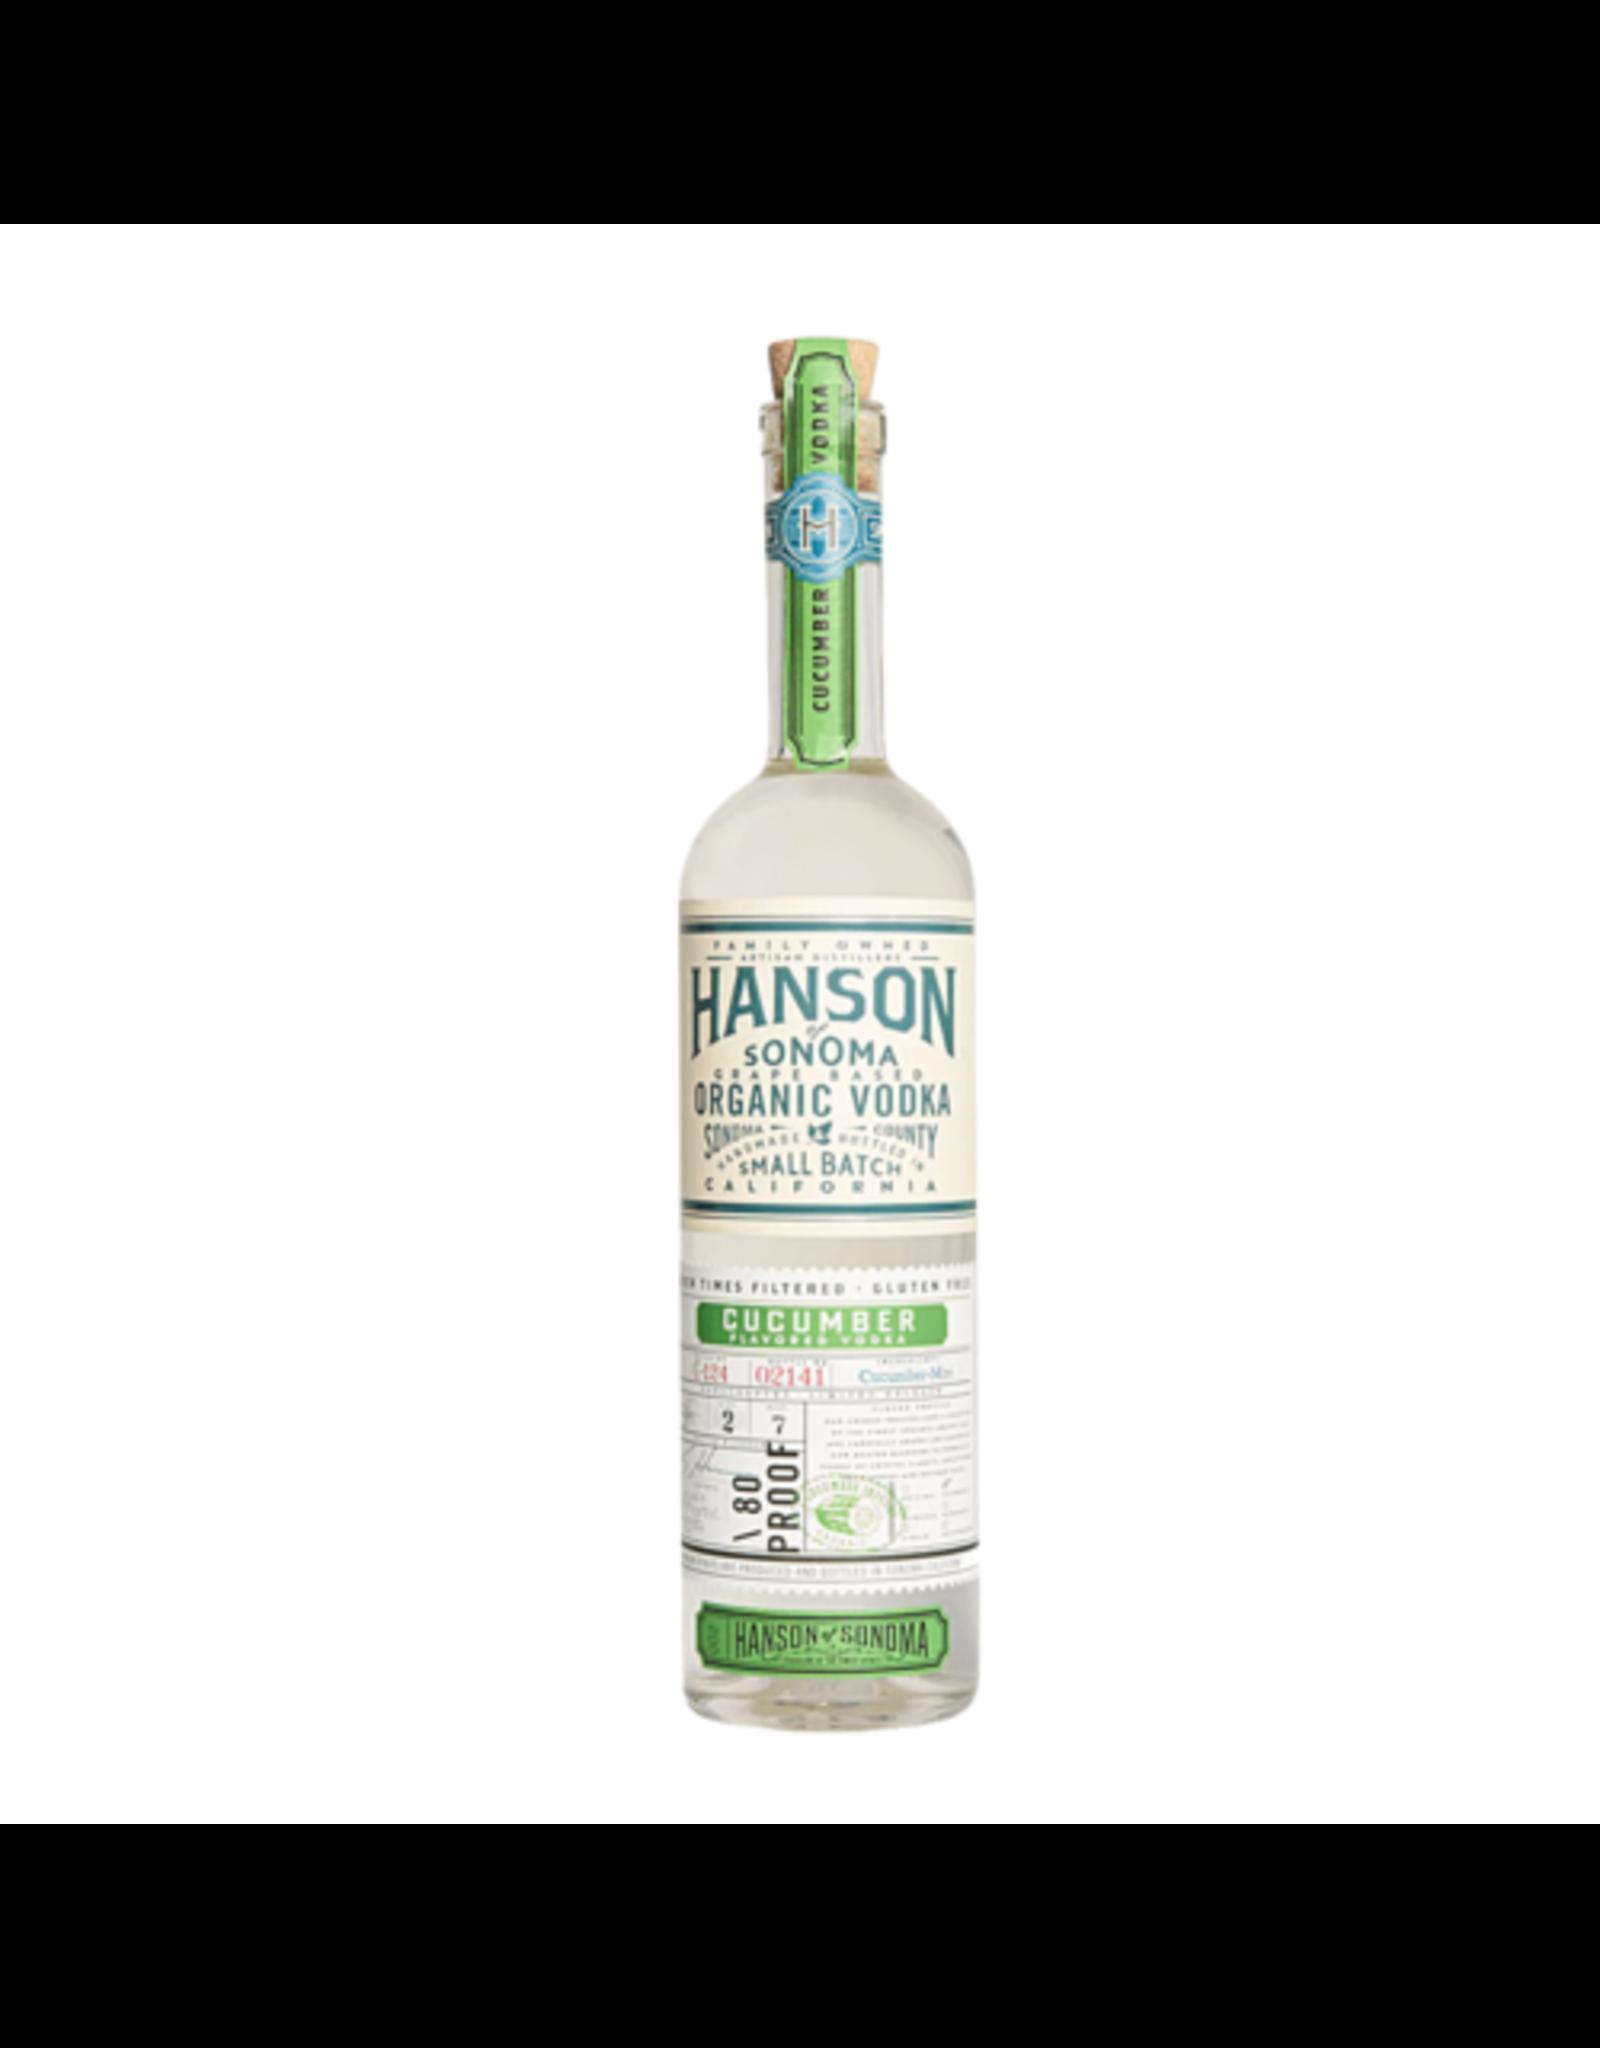 Hanson Cucumber Vodka